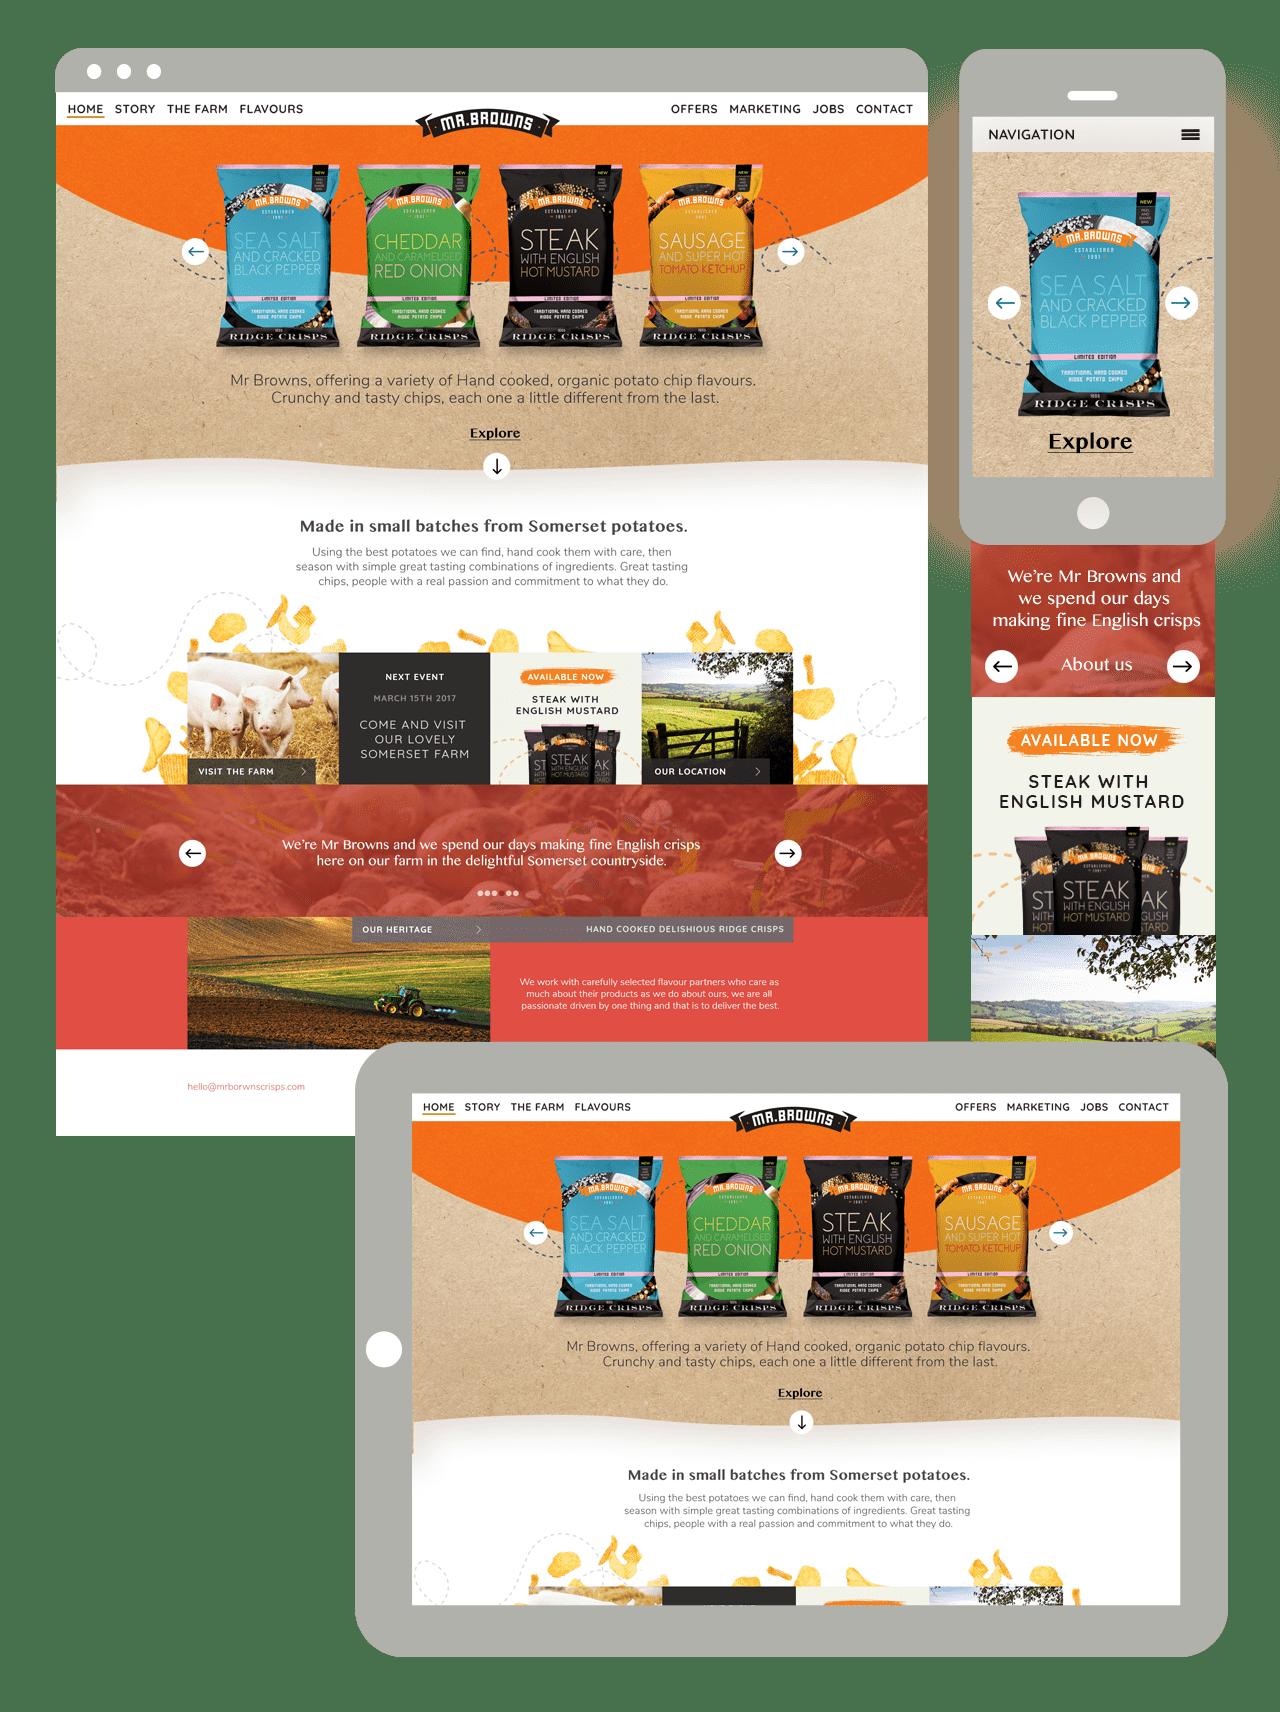 website design services and ecommerce website design services by web agency Polkadot Agency based in Yeovil, Somerset UK